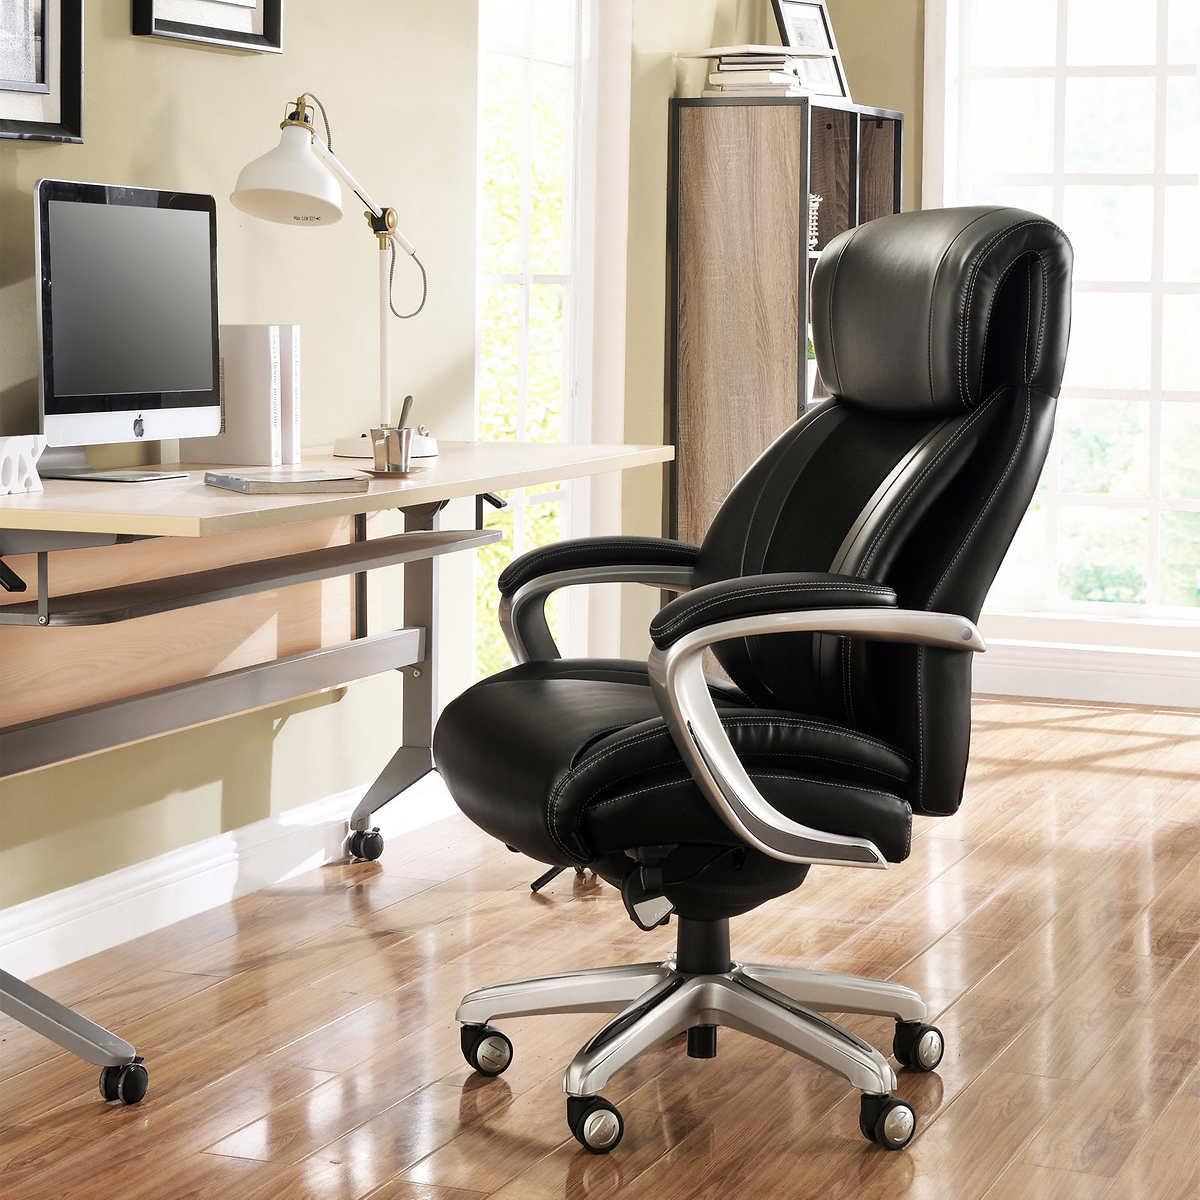 executive black boy z review la watch chair youtube lazboy office